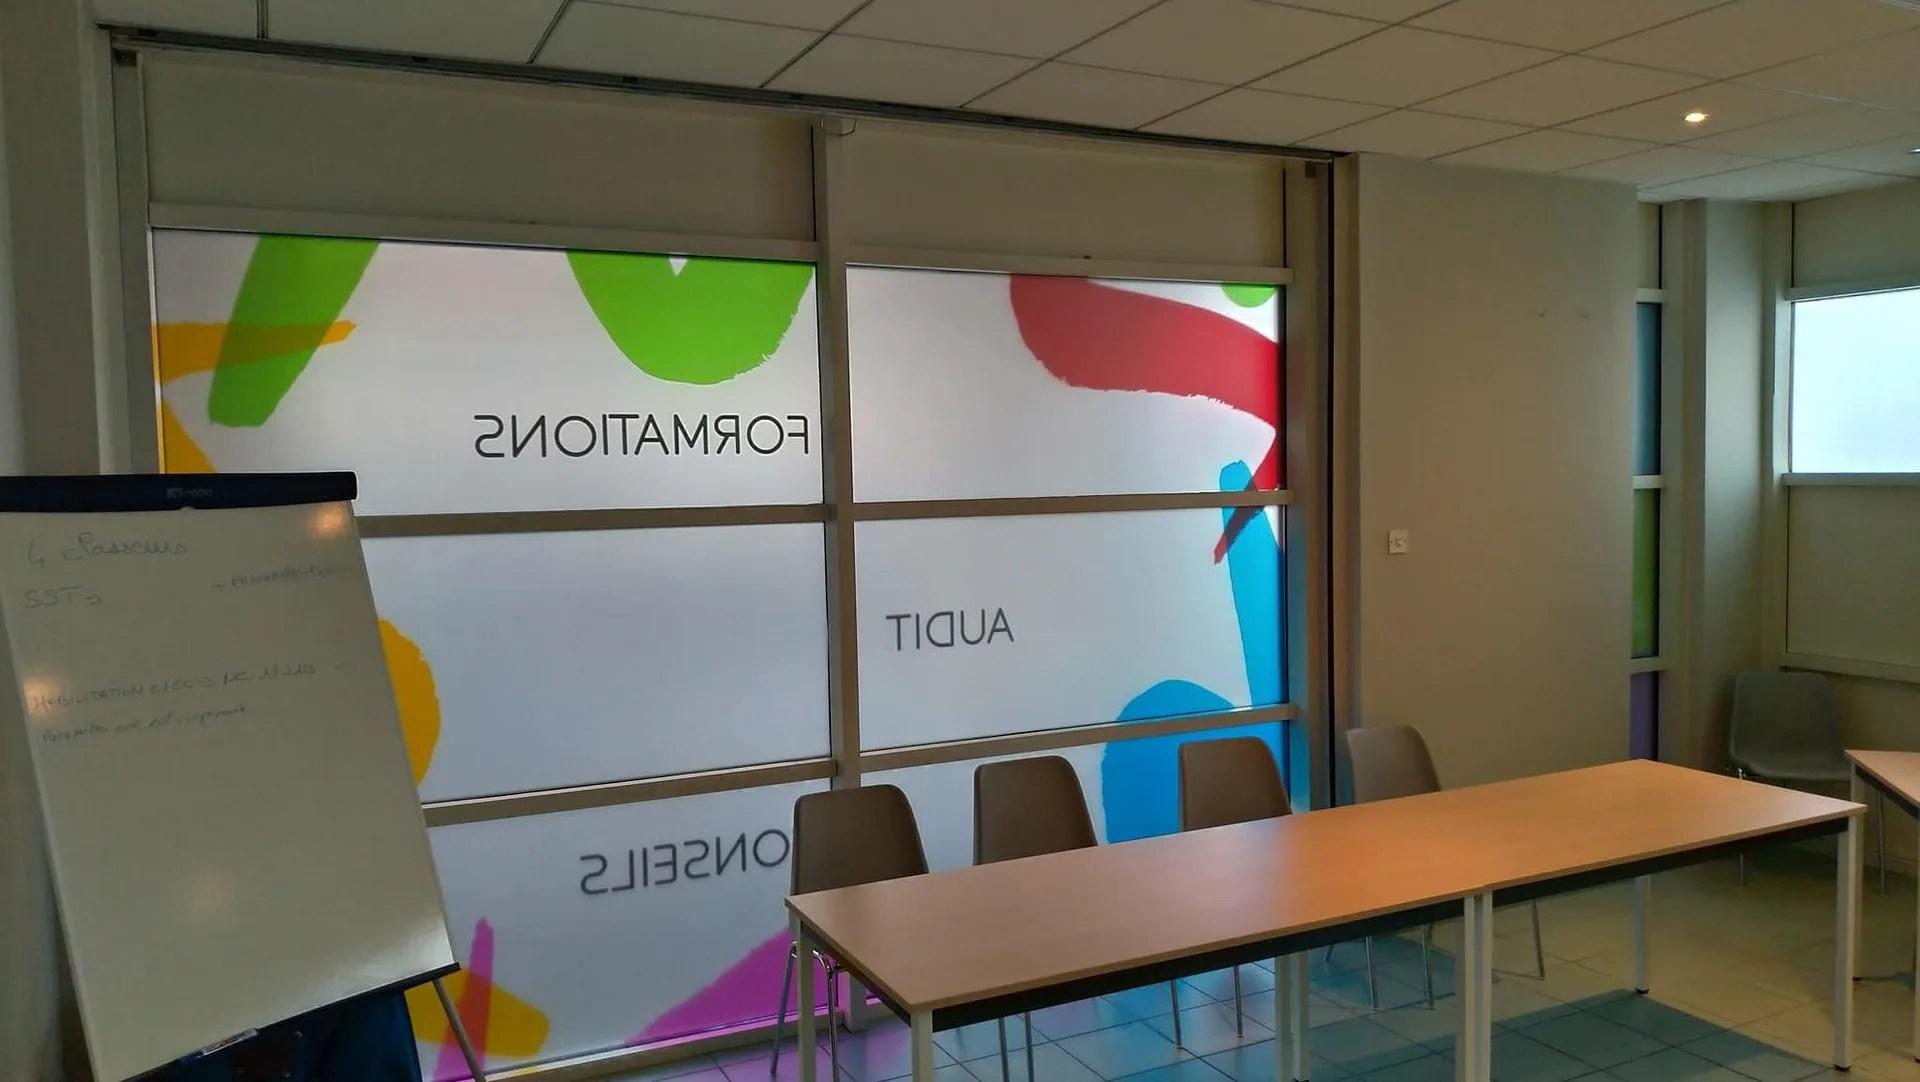 Agence Graphics Vitrophanie Adhesif Decoration Magasin Agence Formation Dax